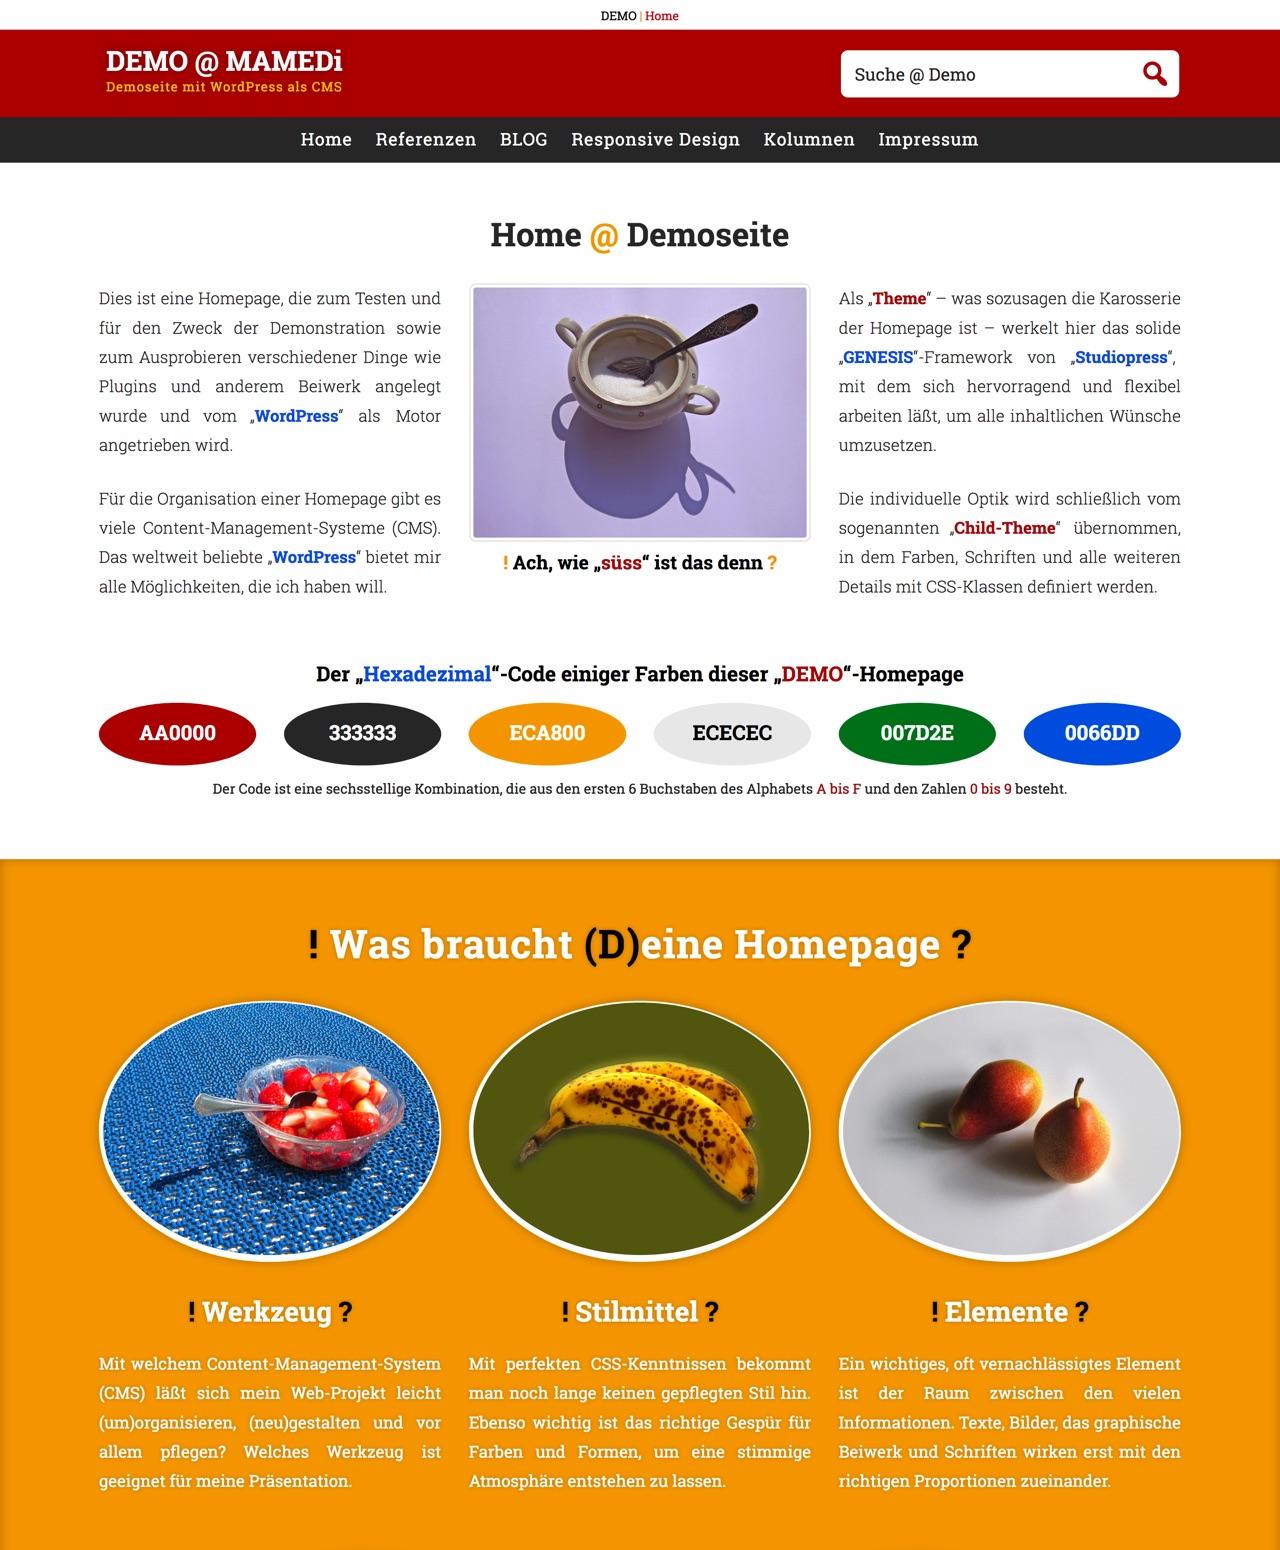 DEMO-Homepage